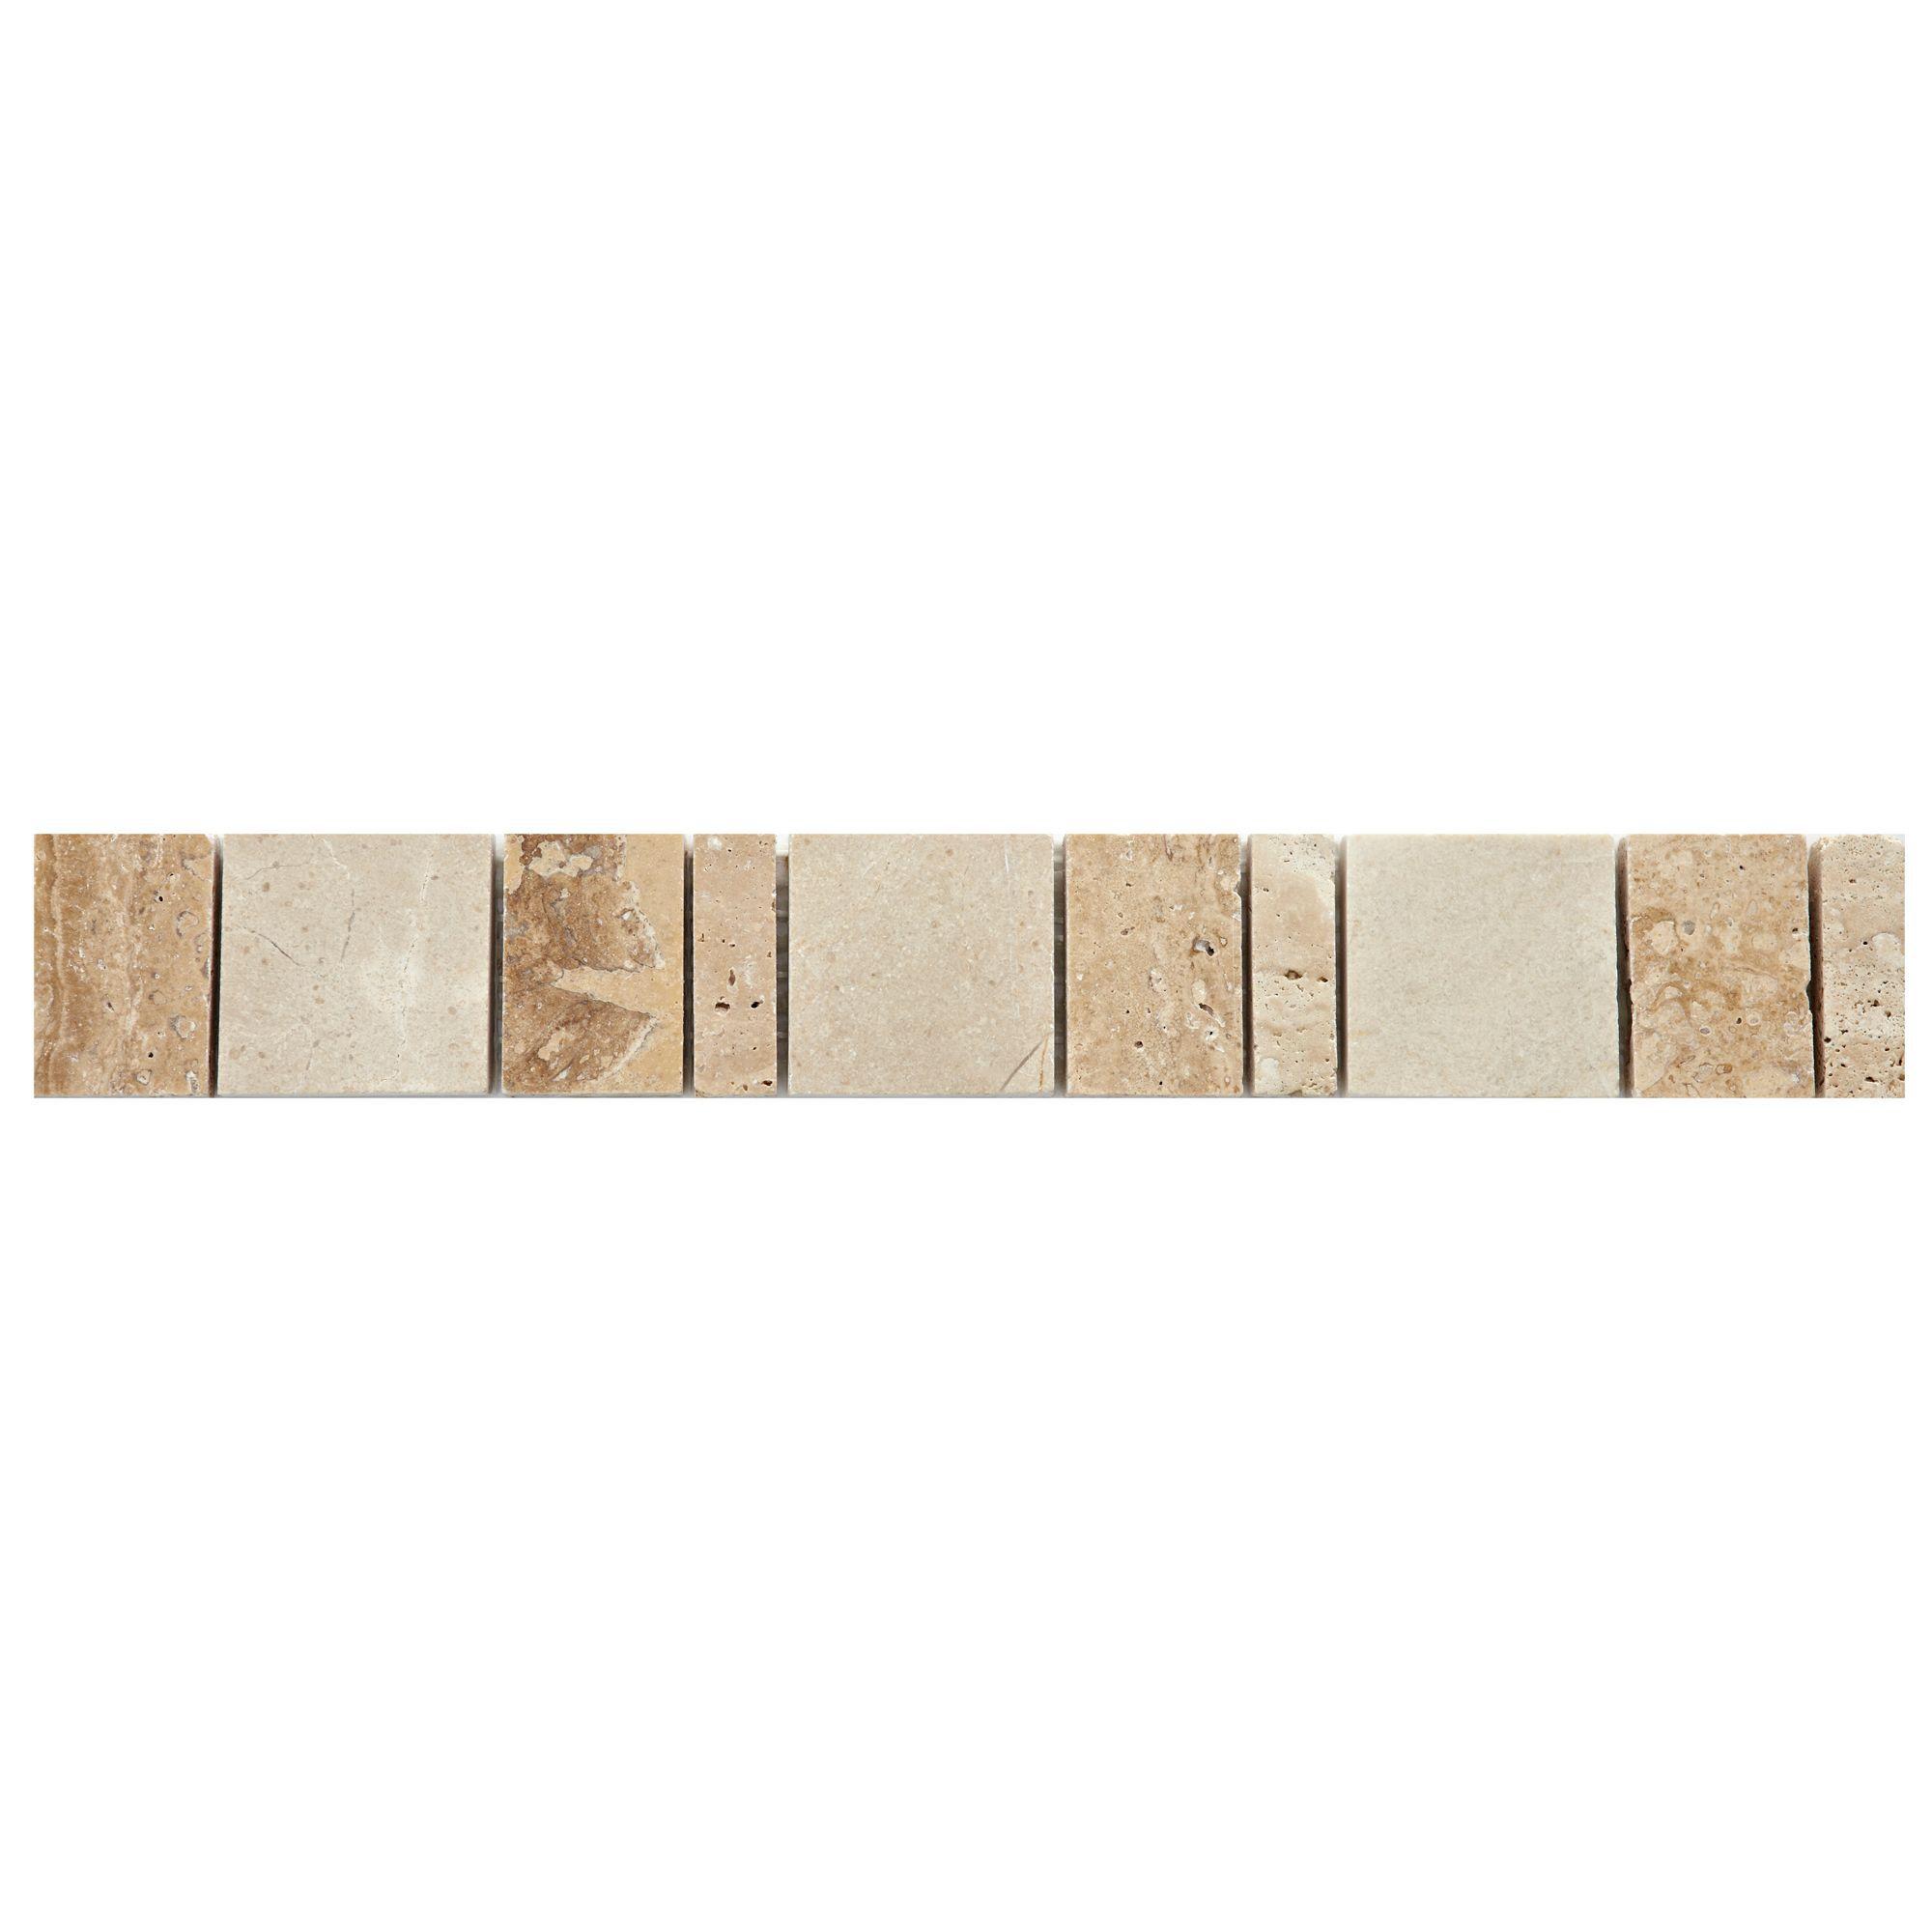 Sunstone Natural Mosaic Ceramic Border Tile, (l)333mm (w)48mm